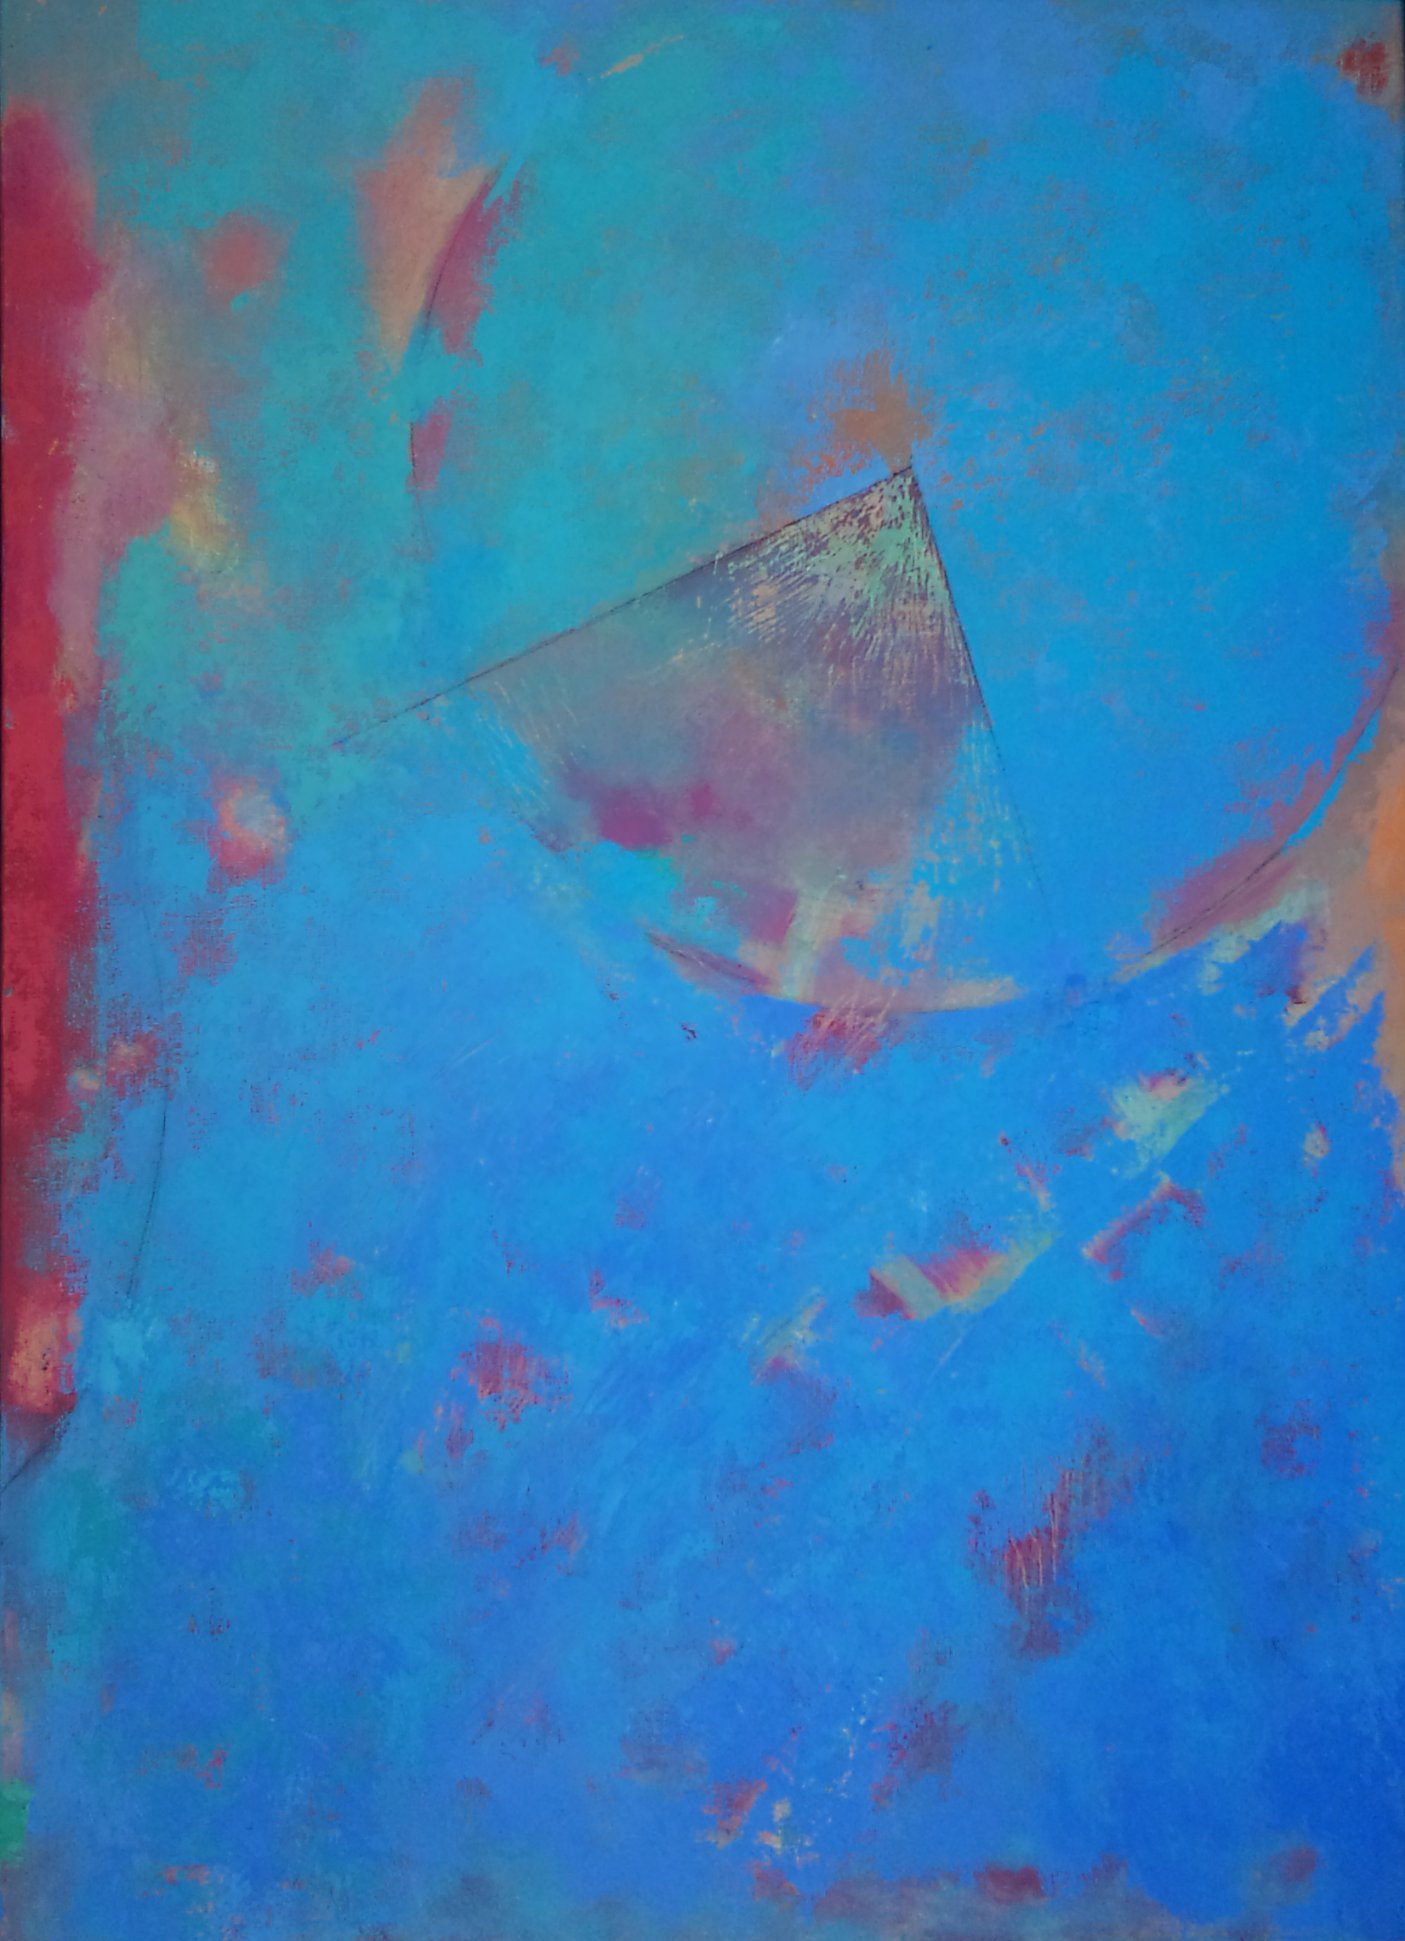 Serie: Mons naixents (mundos nacientes) (2011) - Adelaida Murillo